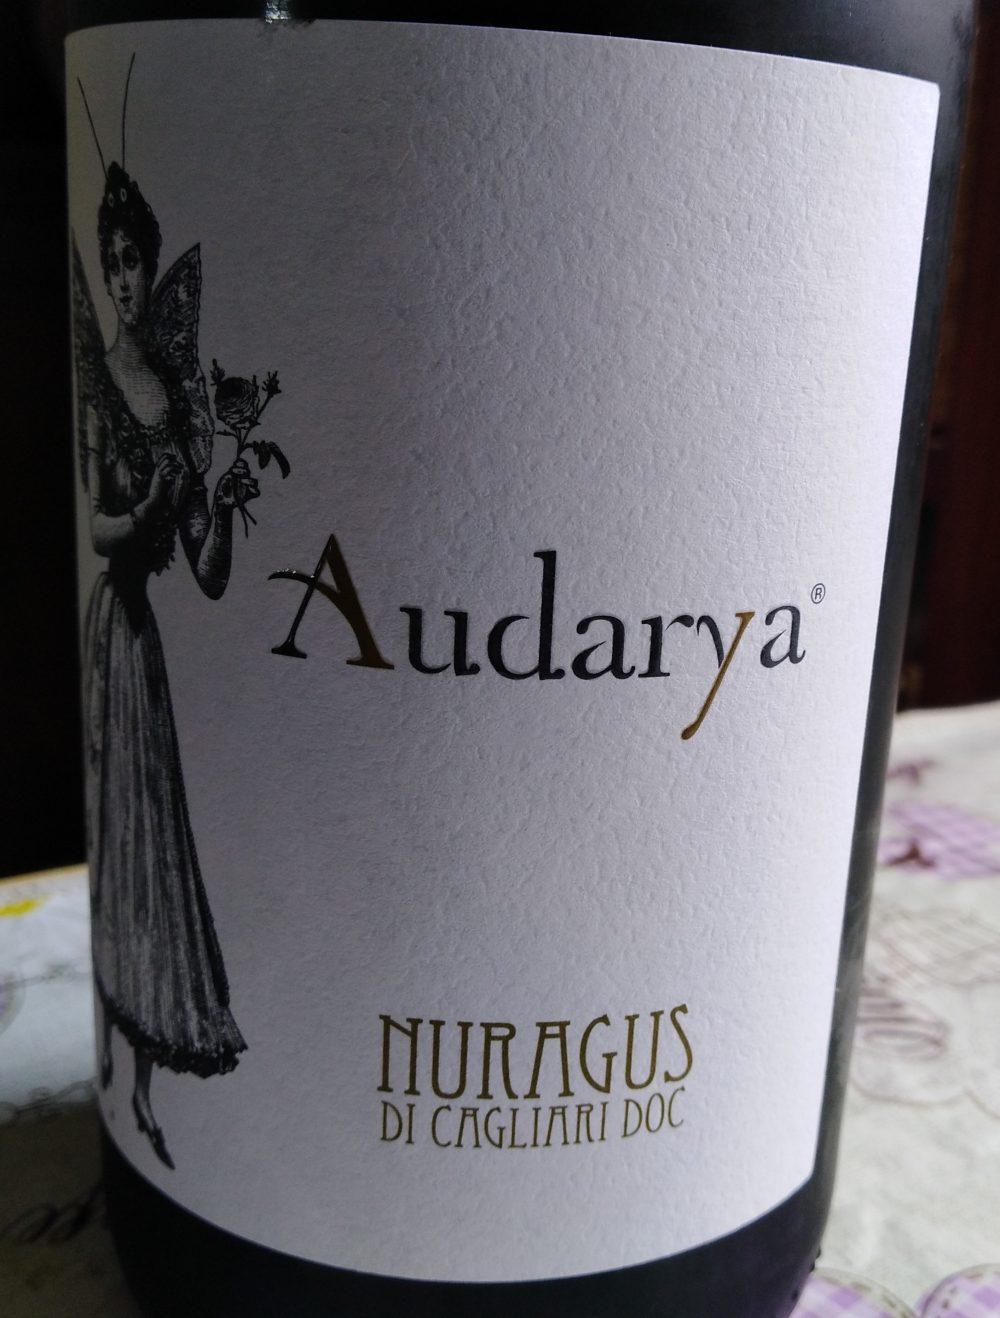 Nuragus di Cagliari Doc 2018 Audarya